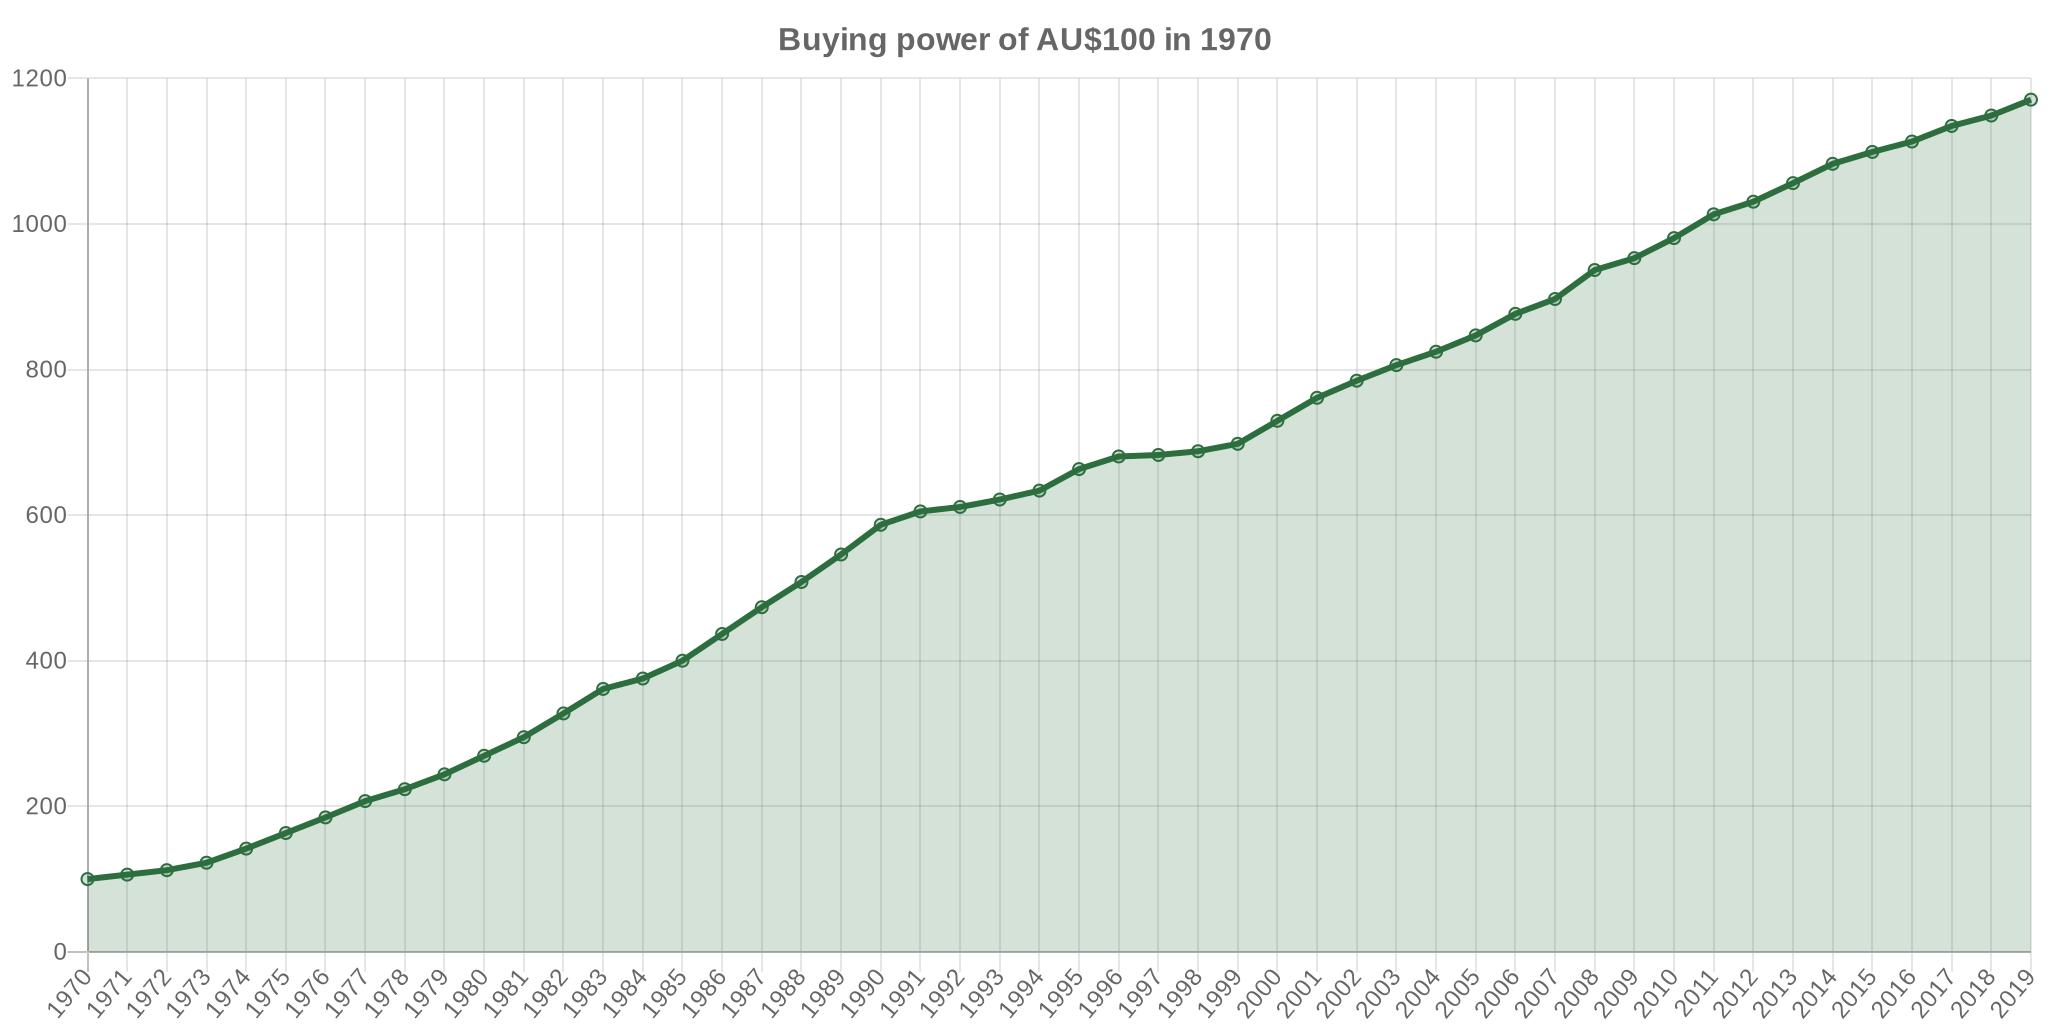 1970 dollars in 2017 | Australia Inflation Calculator